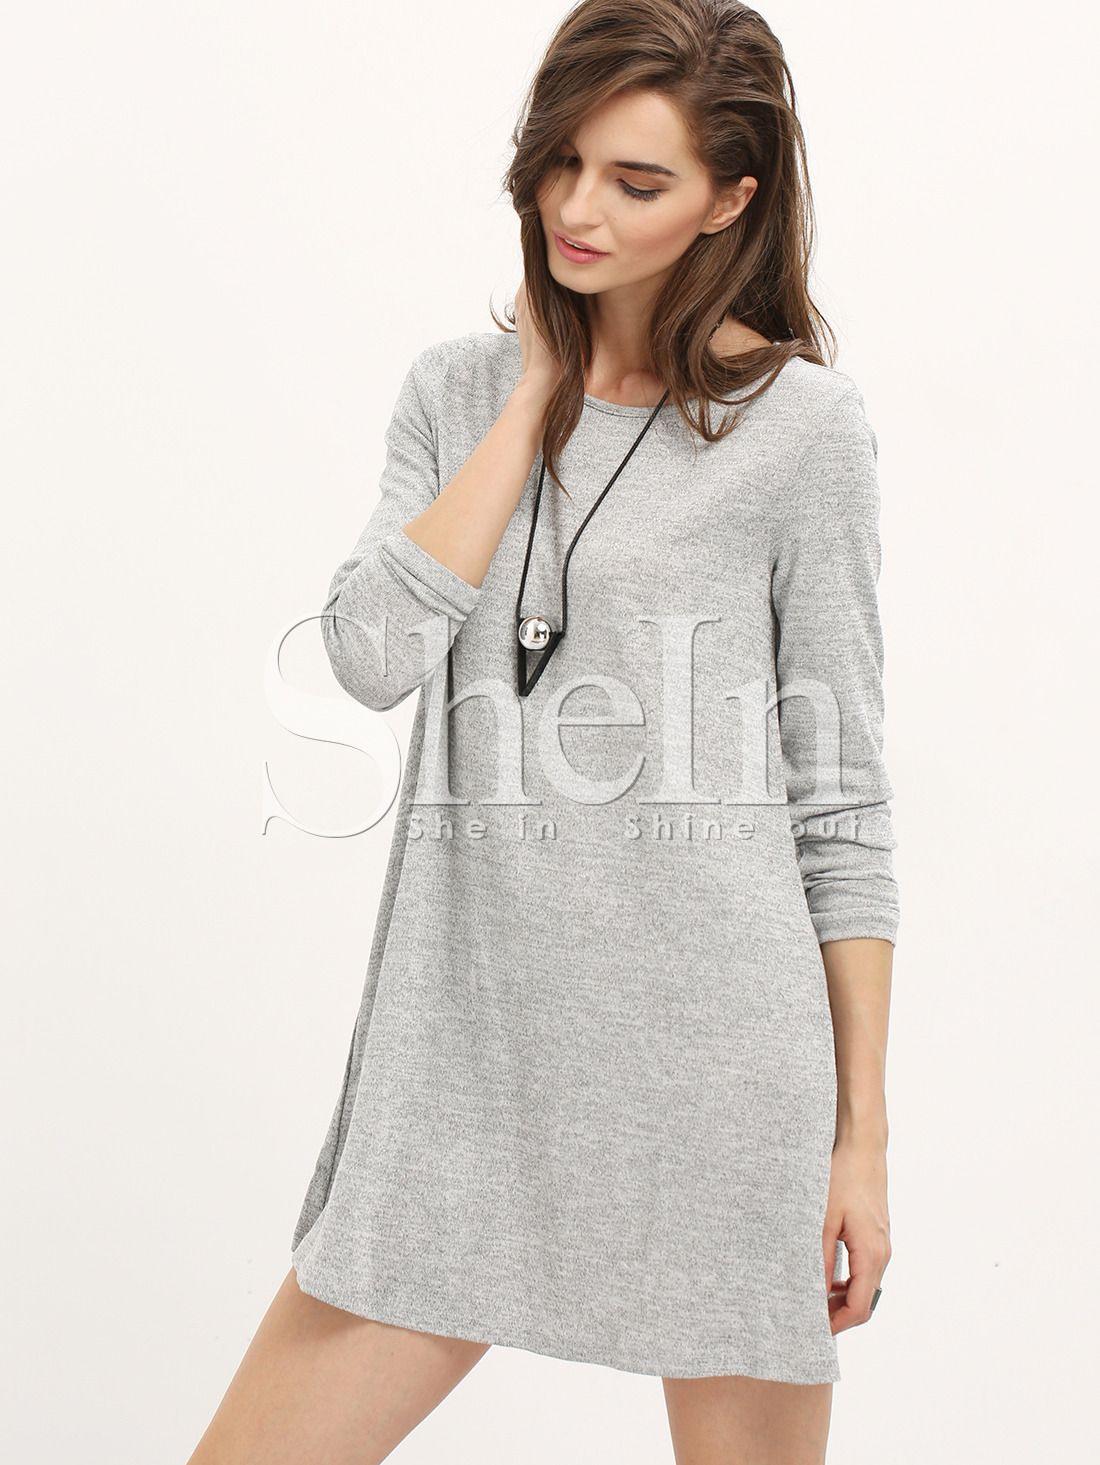 20 Fantastisch Kleid Grau Langarm Stylish20 Perfekt Kleid Grau Langarm Bester Preis